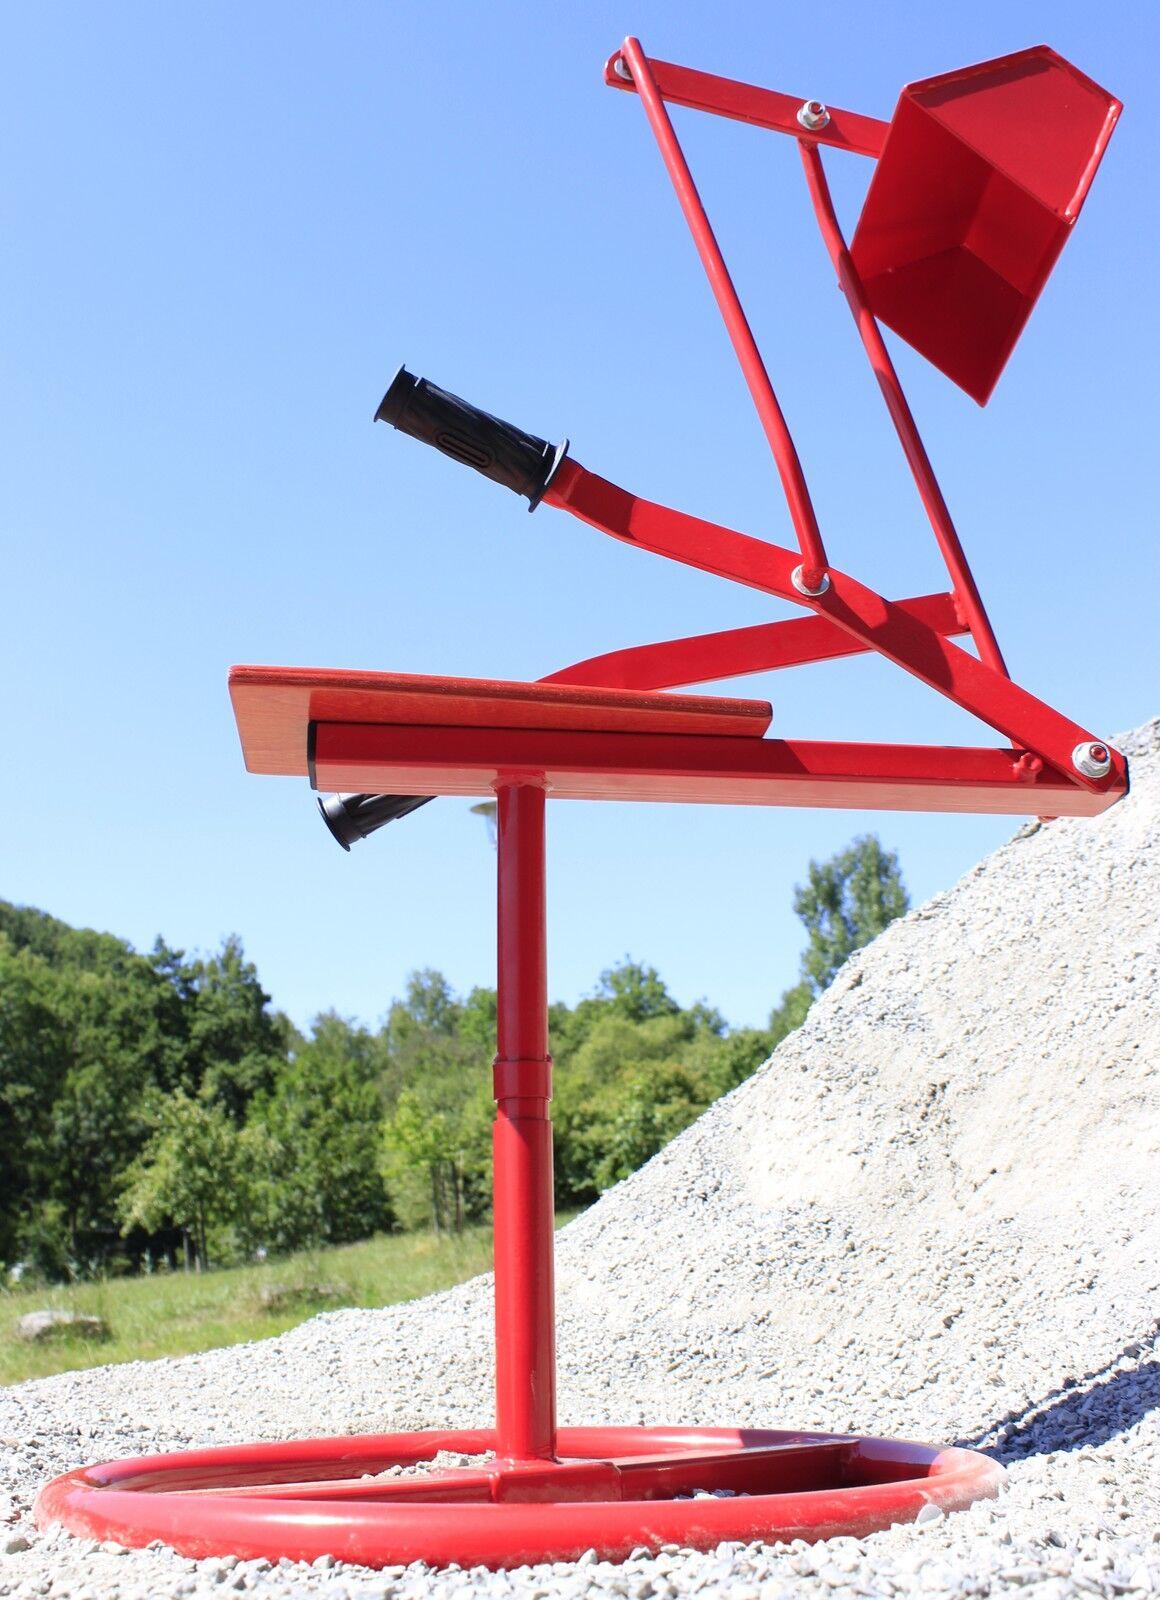 SITZBAGGER Metall Riesen-Sandbagger bis 50Kg belastbar